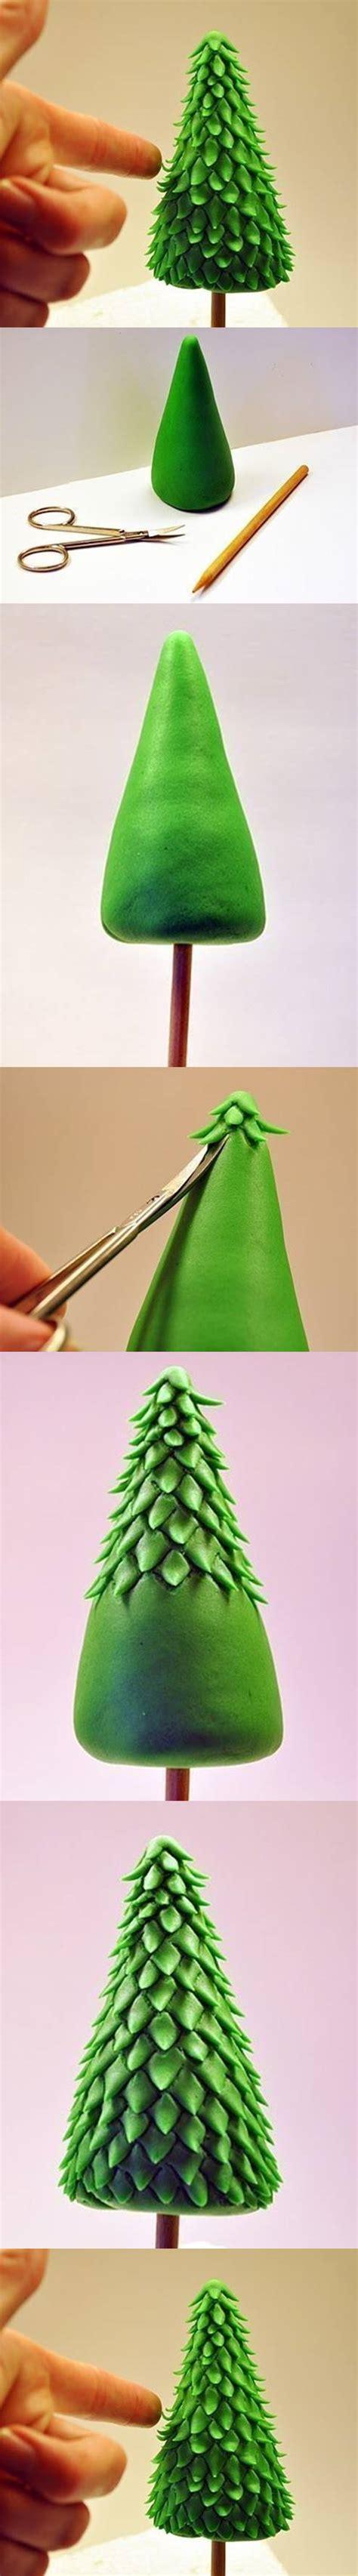 how to make clay christmas tree step by step diy tutorial